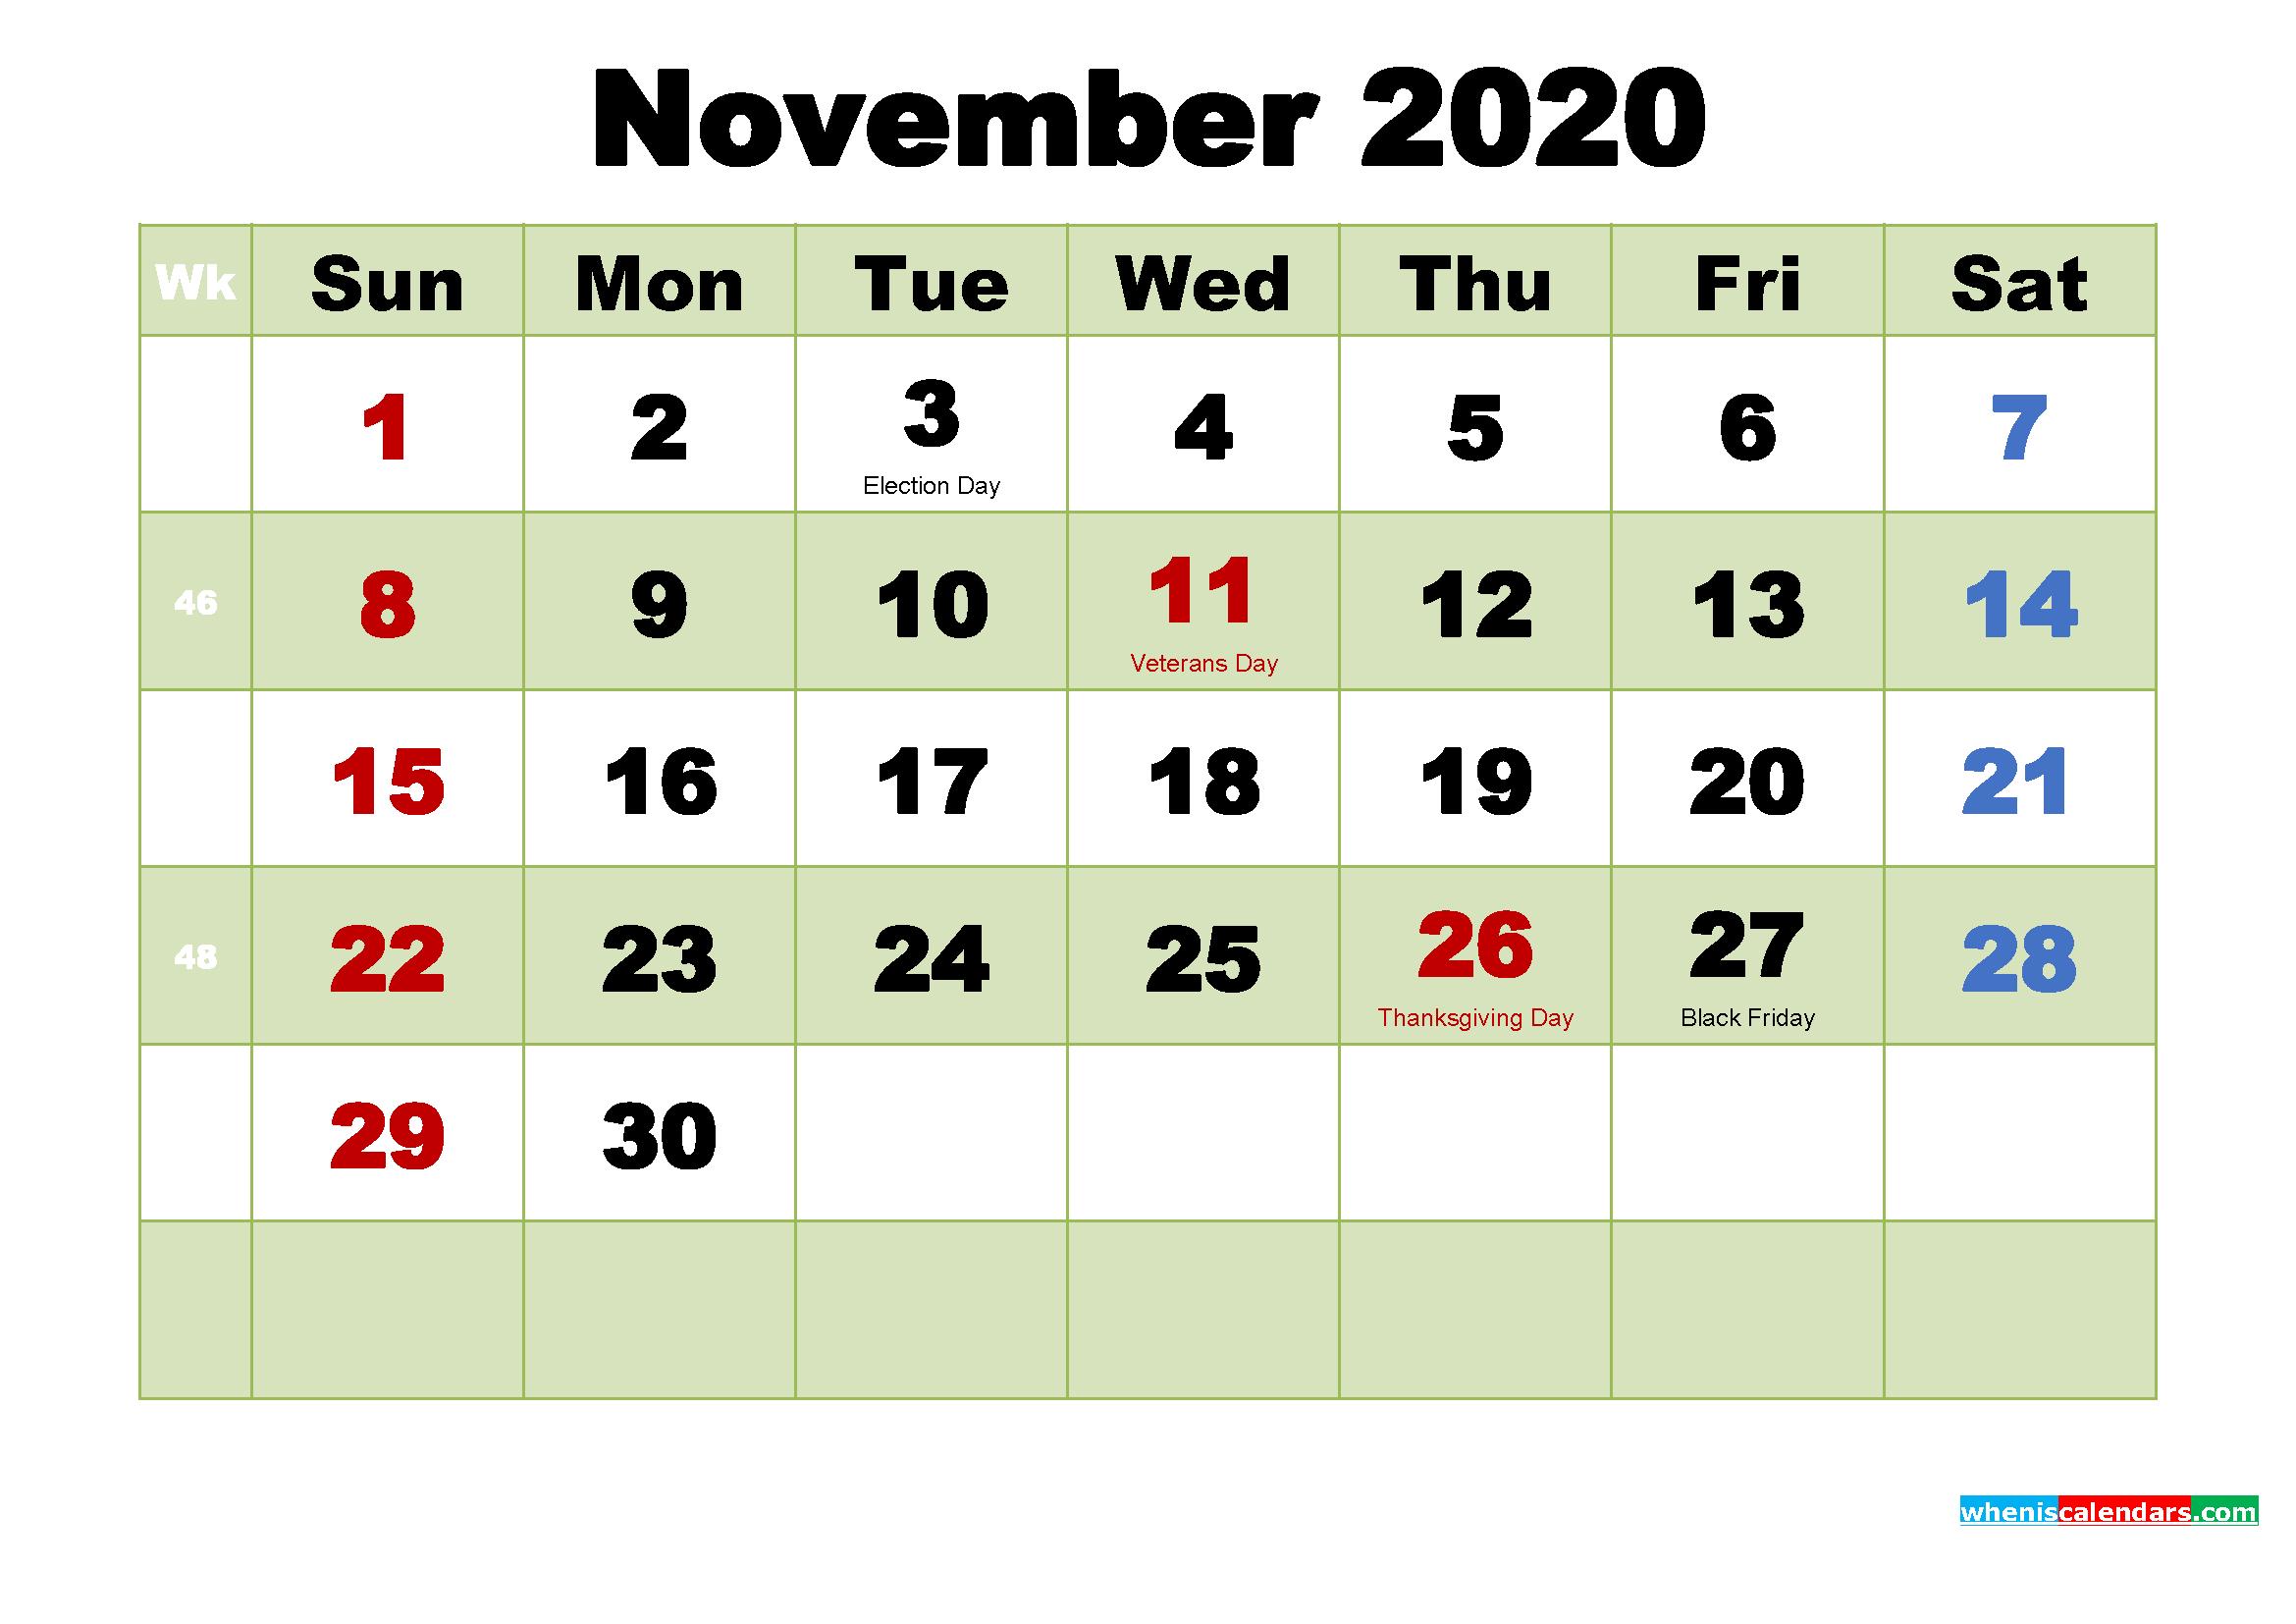 Free November 2020 Printable Calendar Template Word, Pdf